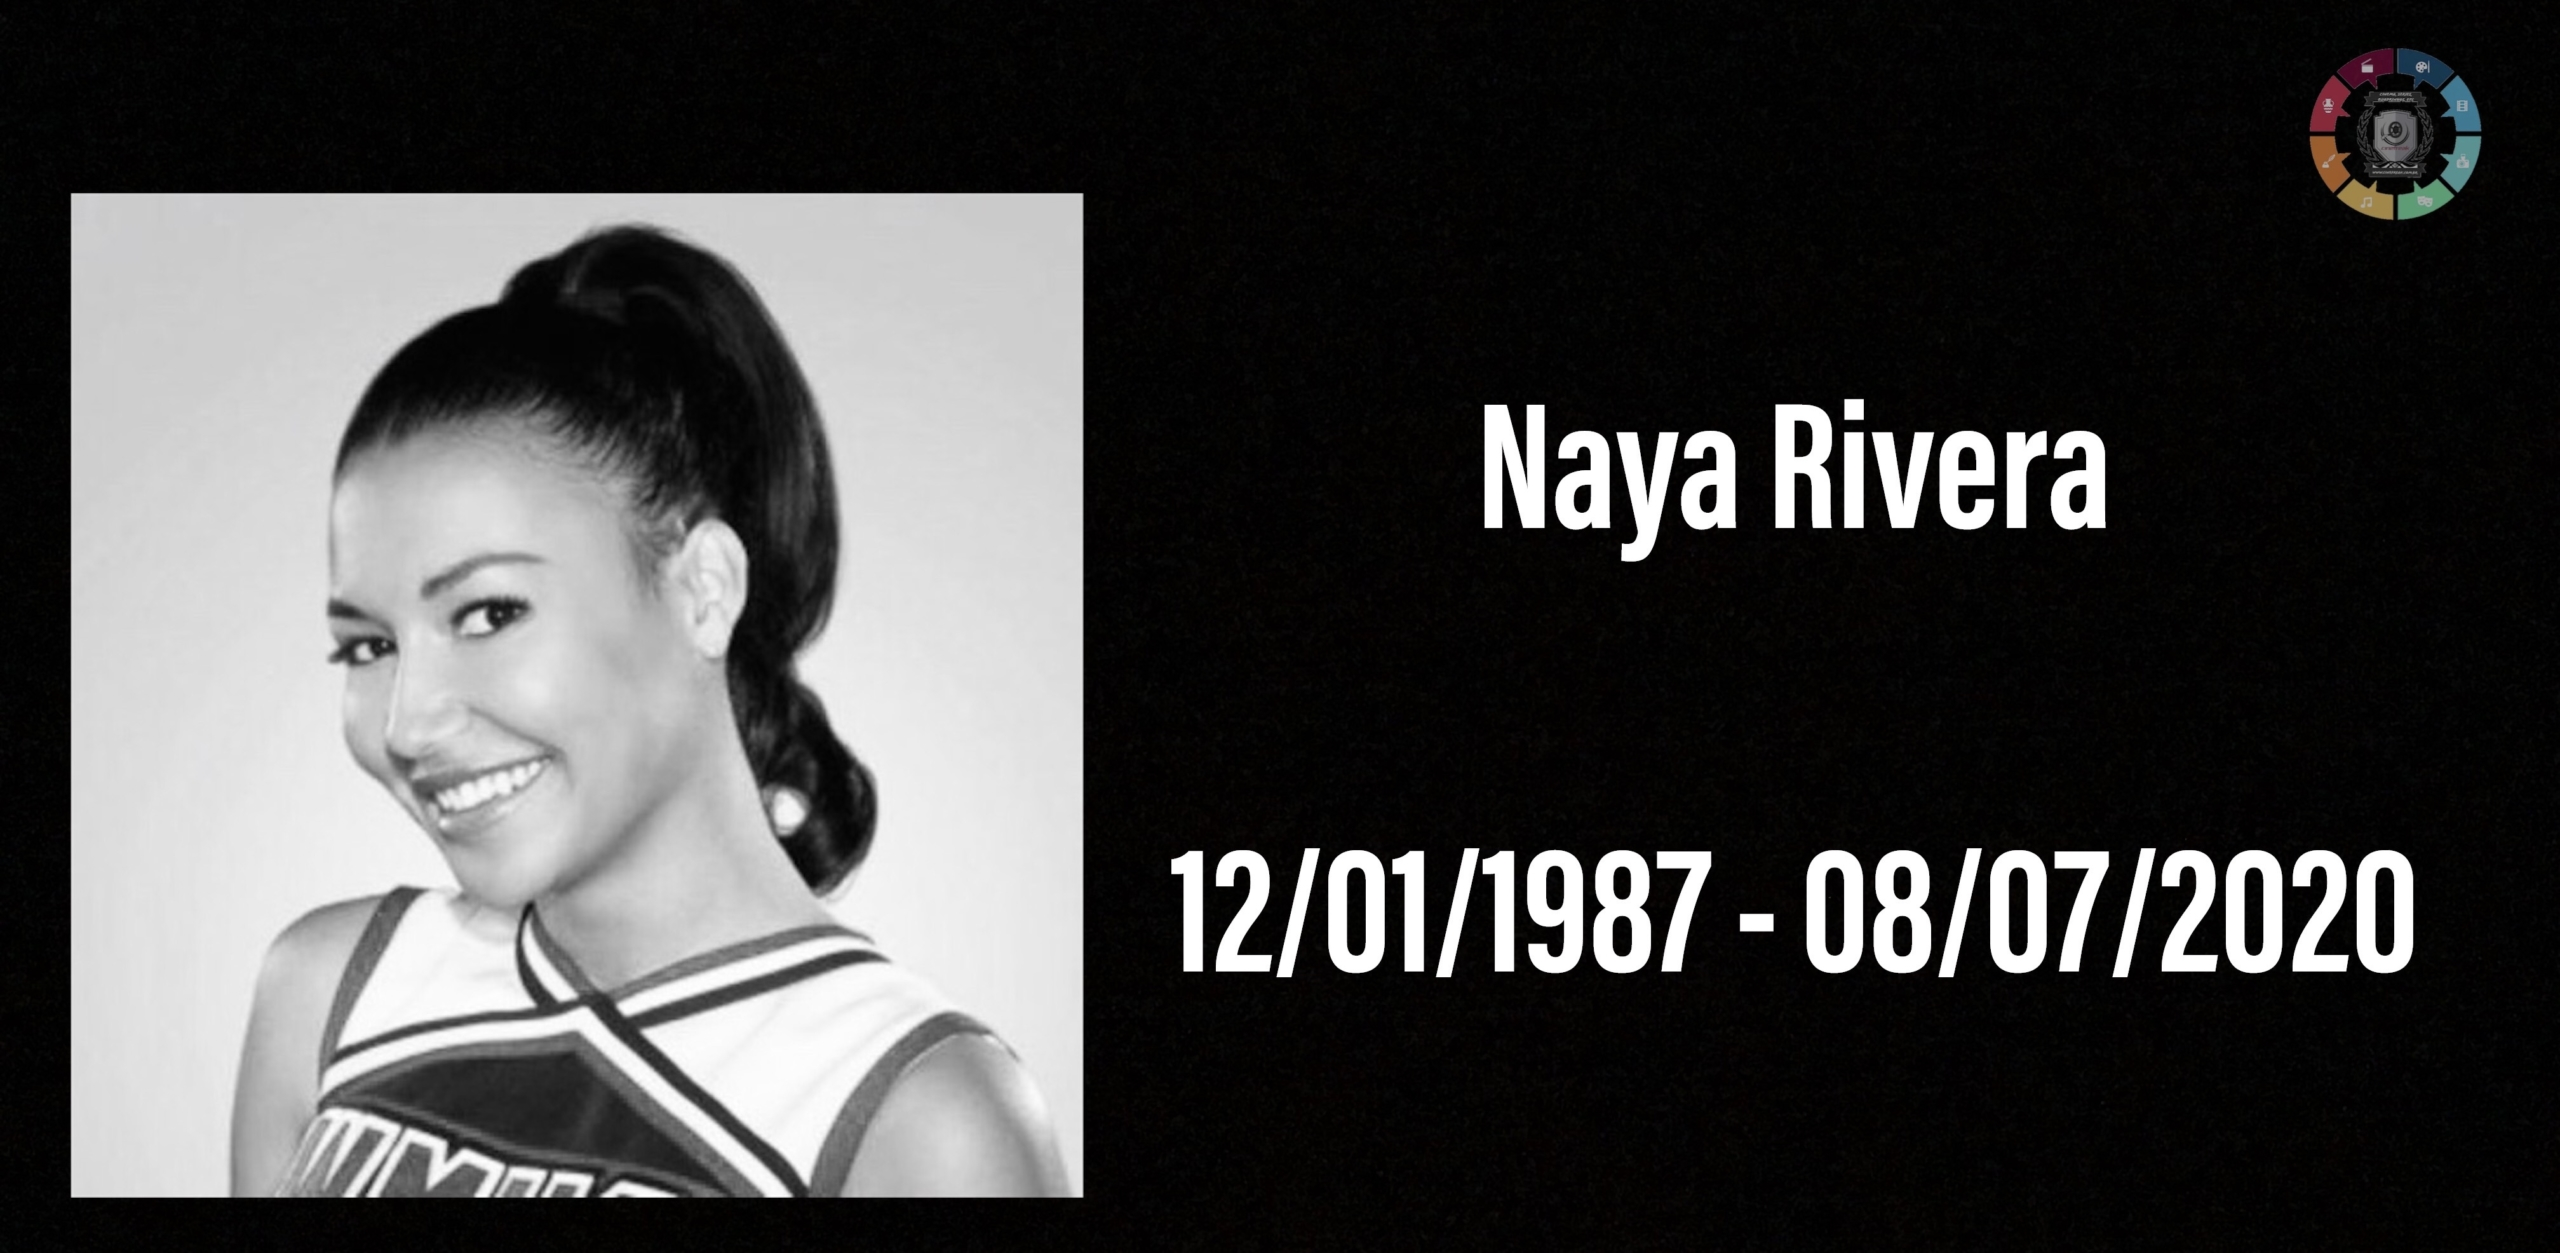 Polícia confirmou a morte de Naya Rivera, de 'Glee', aos 33 anos 3